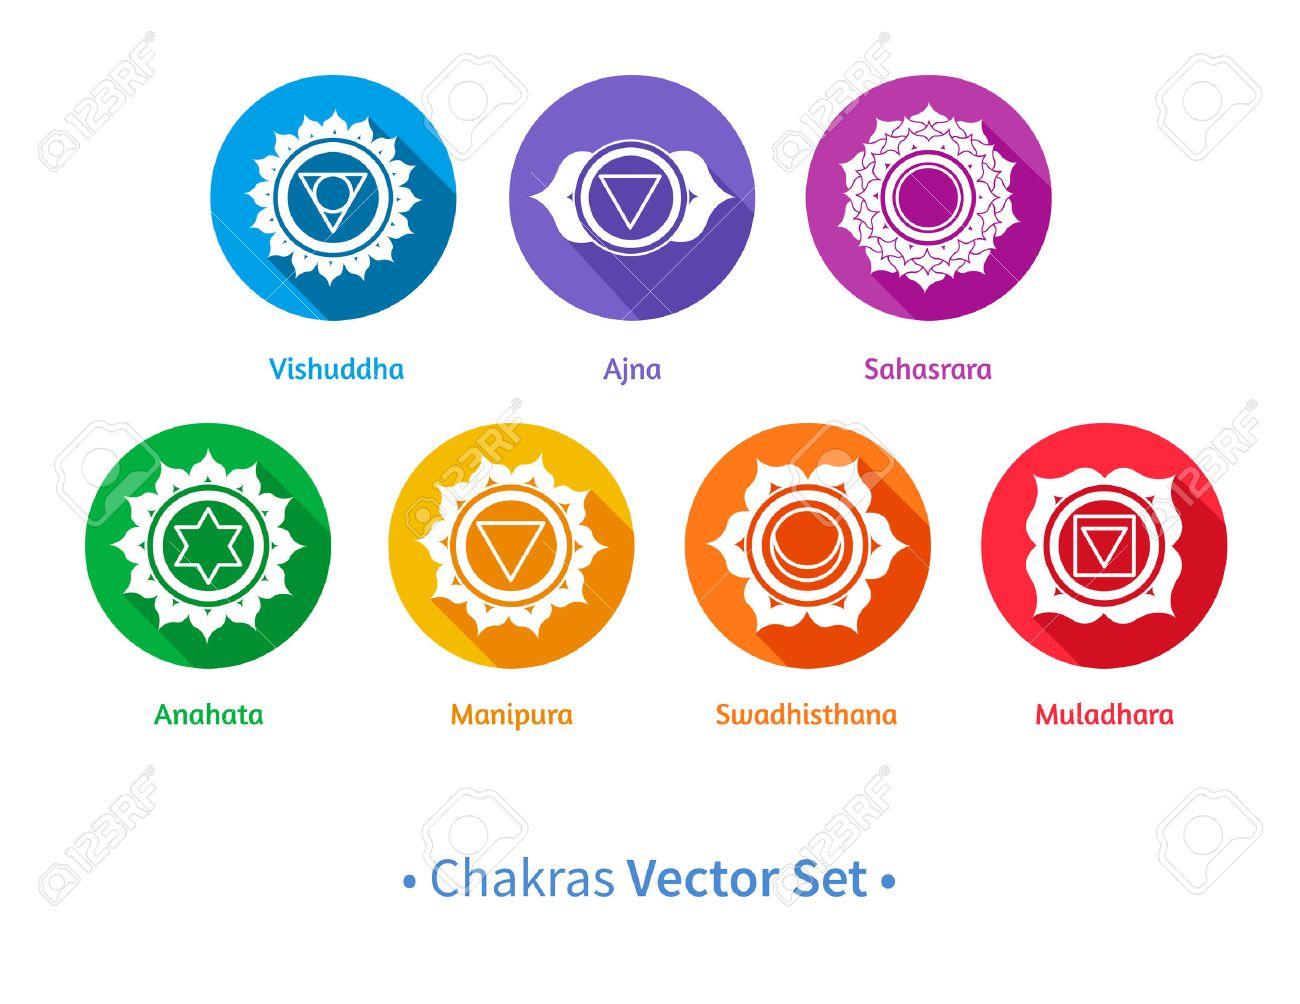 Chakra stock photos royalty free business images vector set of chakra symbols illustration buycottarizona Image collections